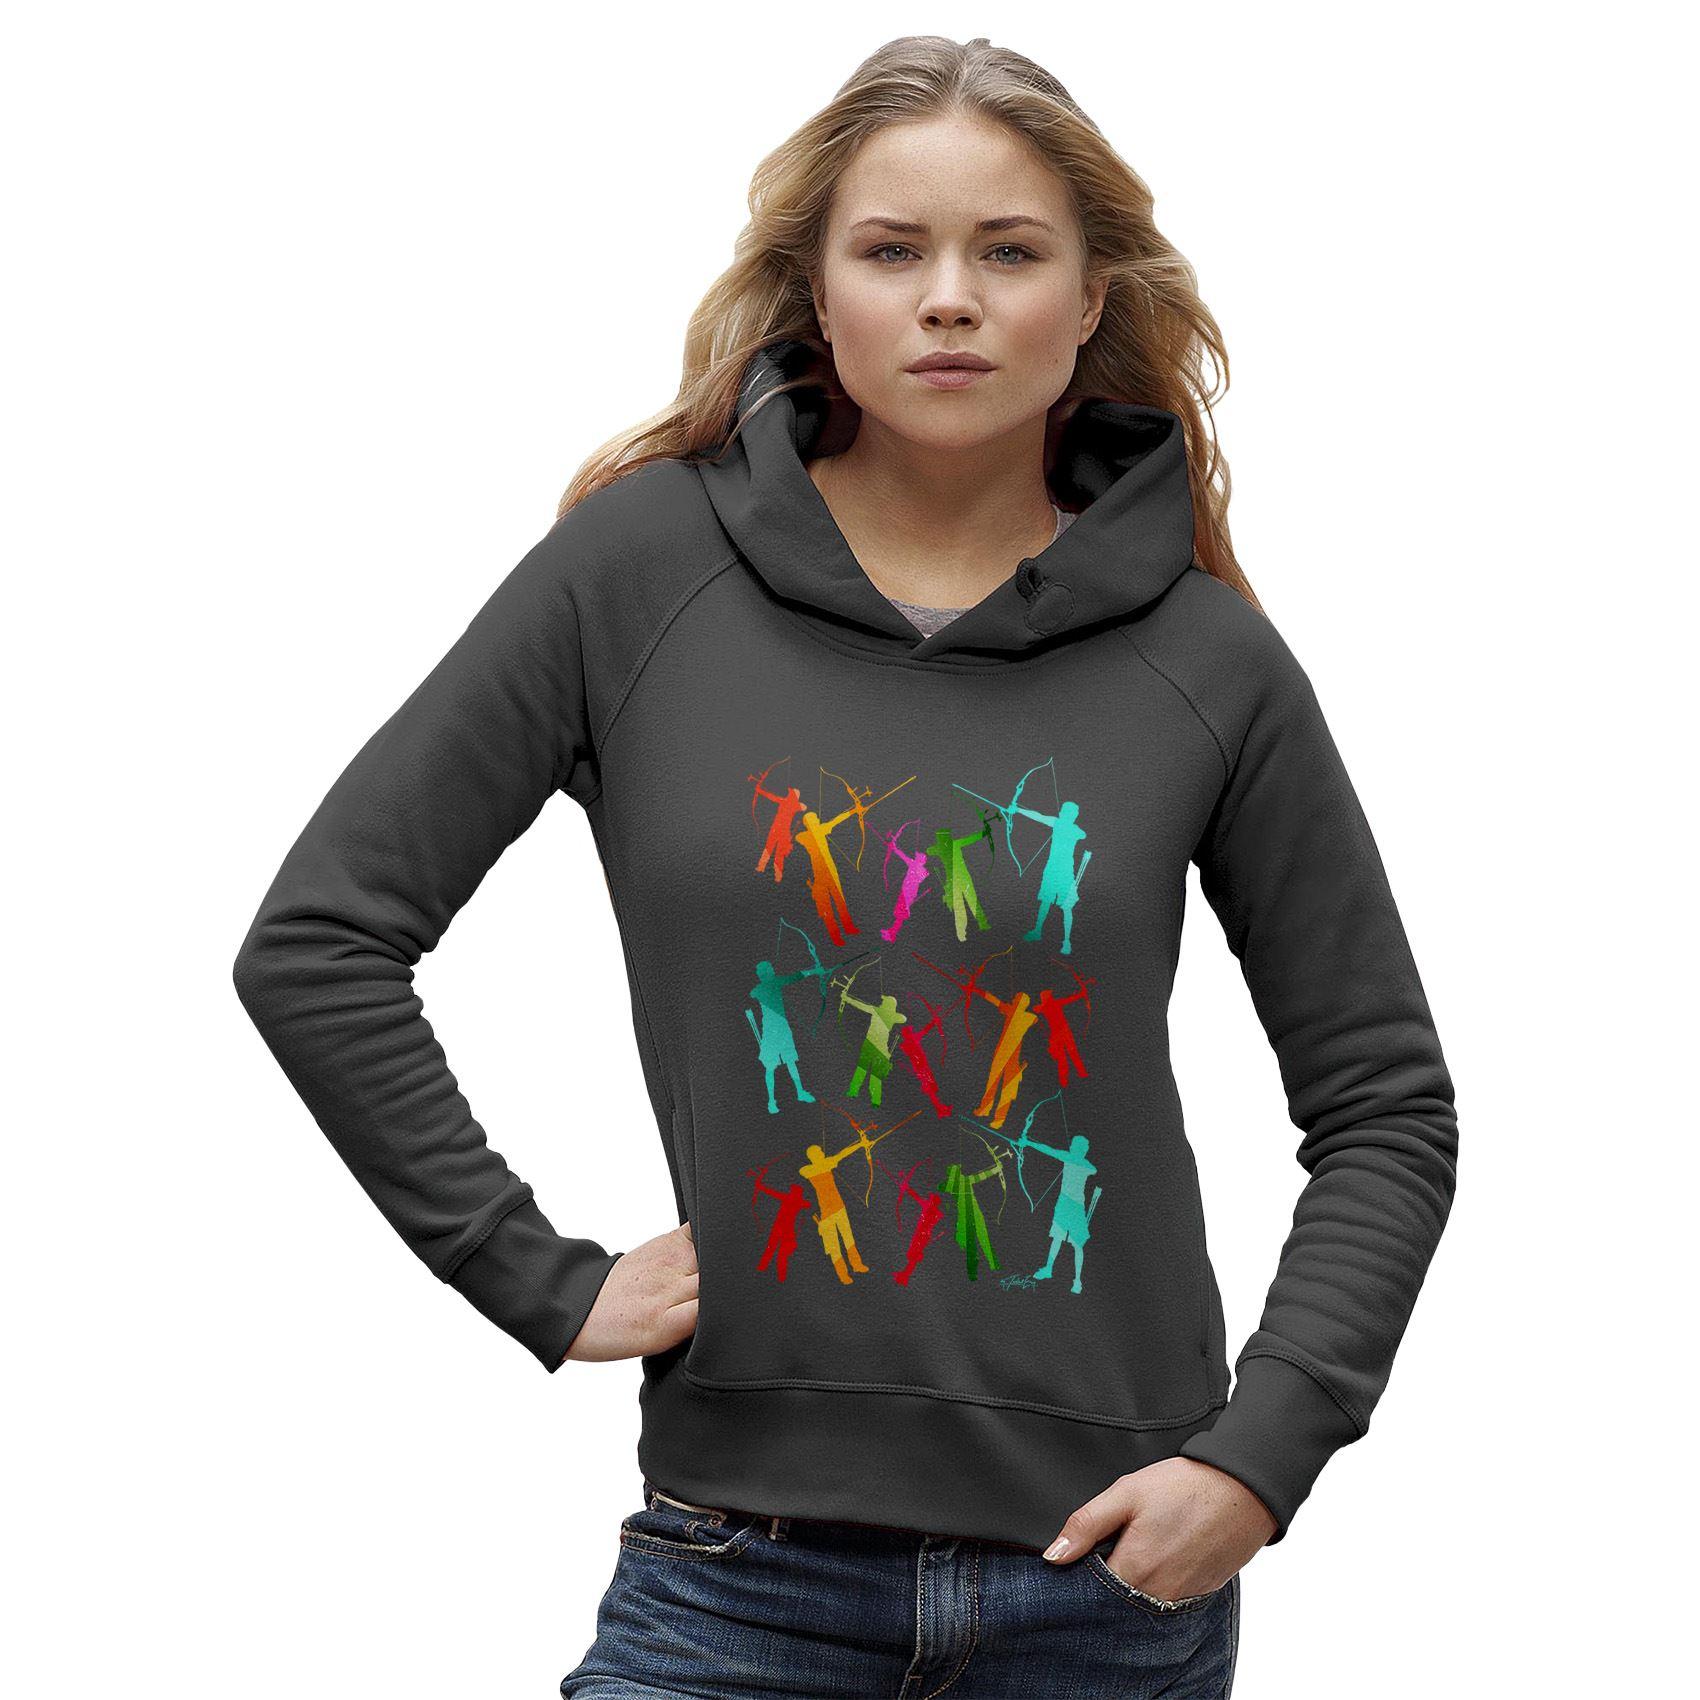 1700x1700 Twisted Envy Women's Archery Rainbow Silhouette Hoodie Ebay